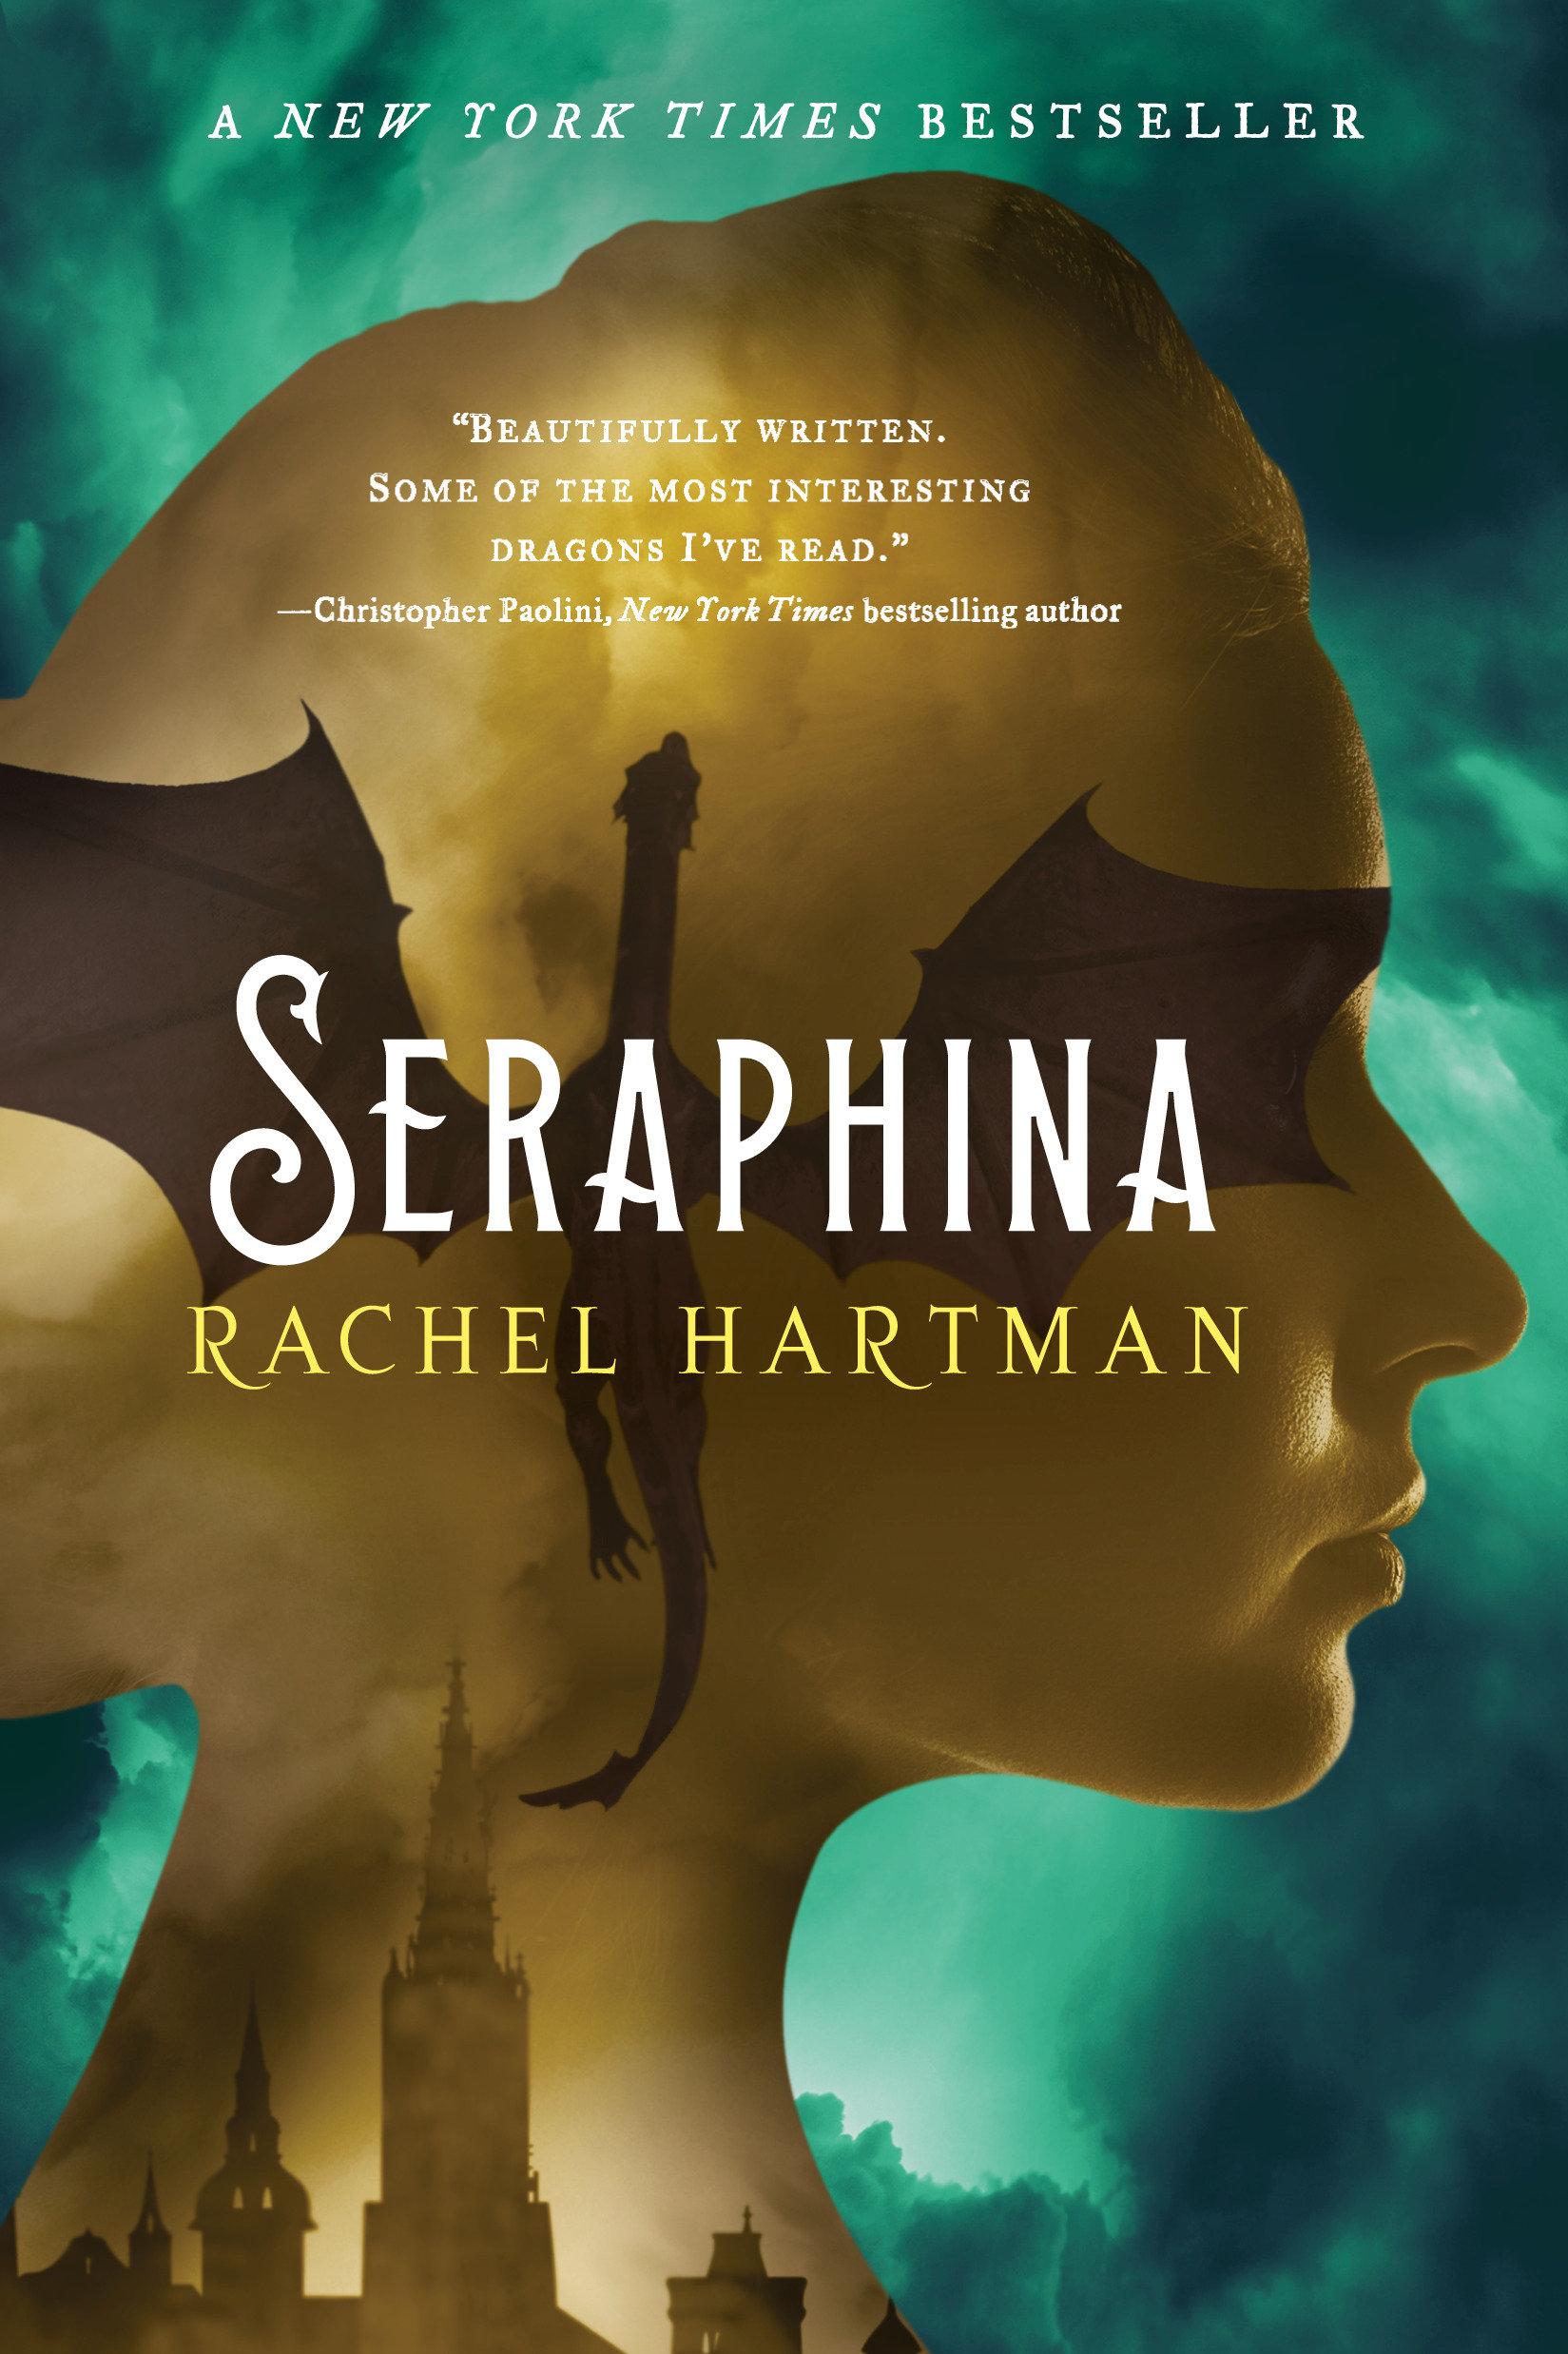 Seraphina cover image